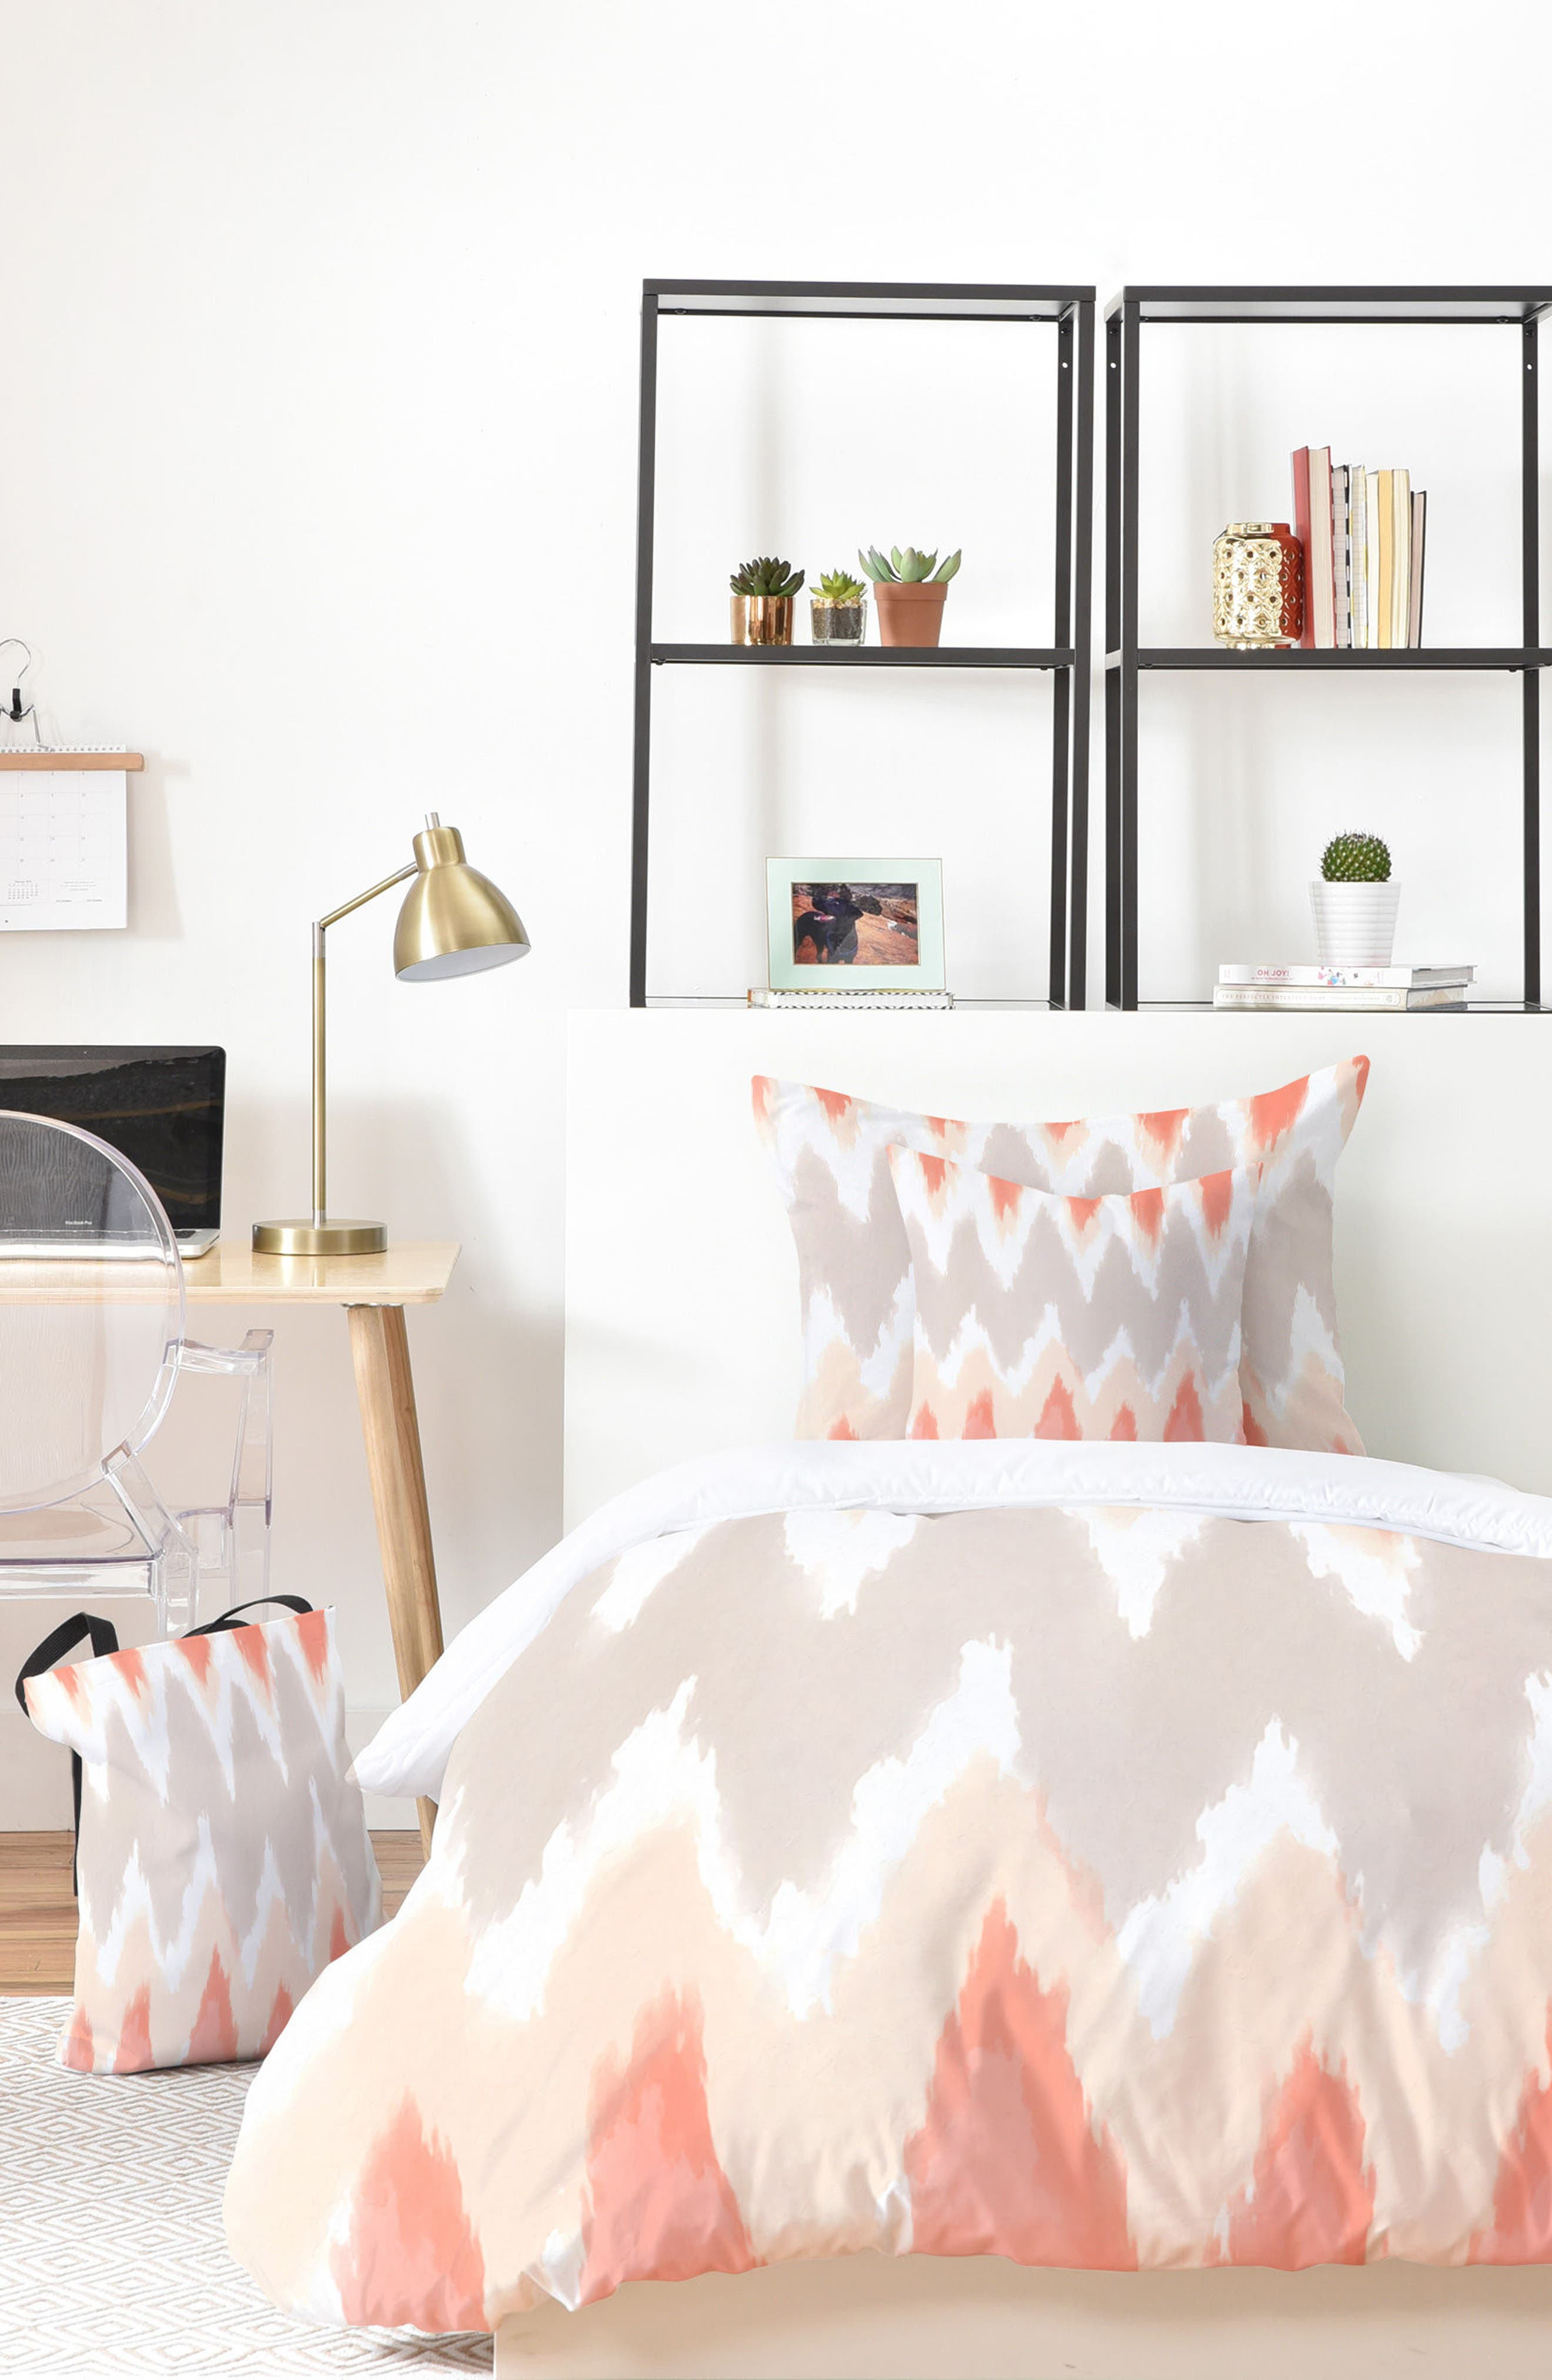 DENY Designs Zoe Wodarz Zigzagzig Bed in a Bag Duvet Cover, Sham & Accent Pillow Set